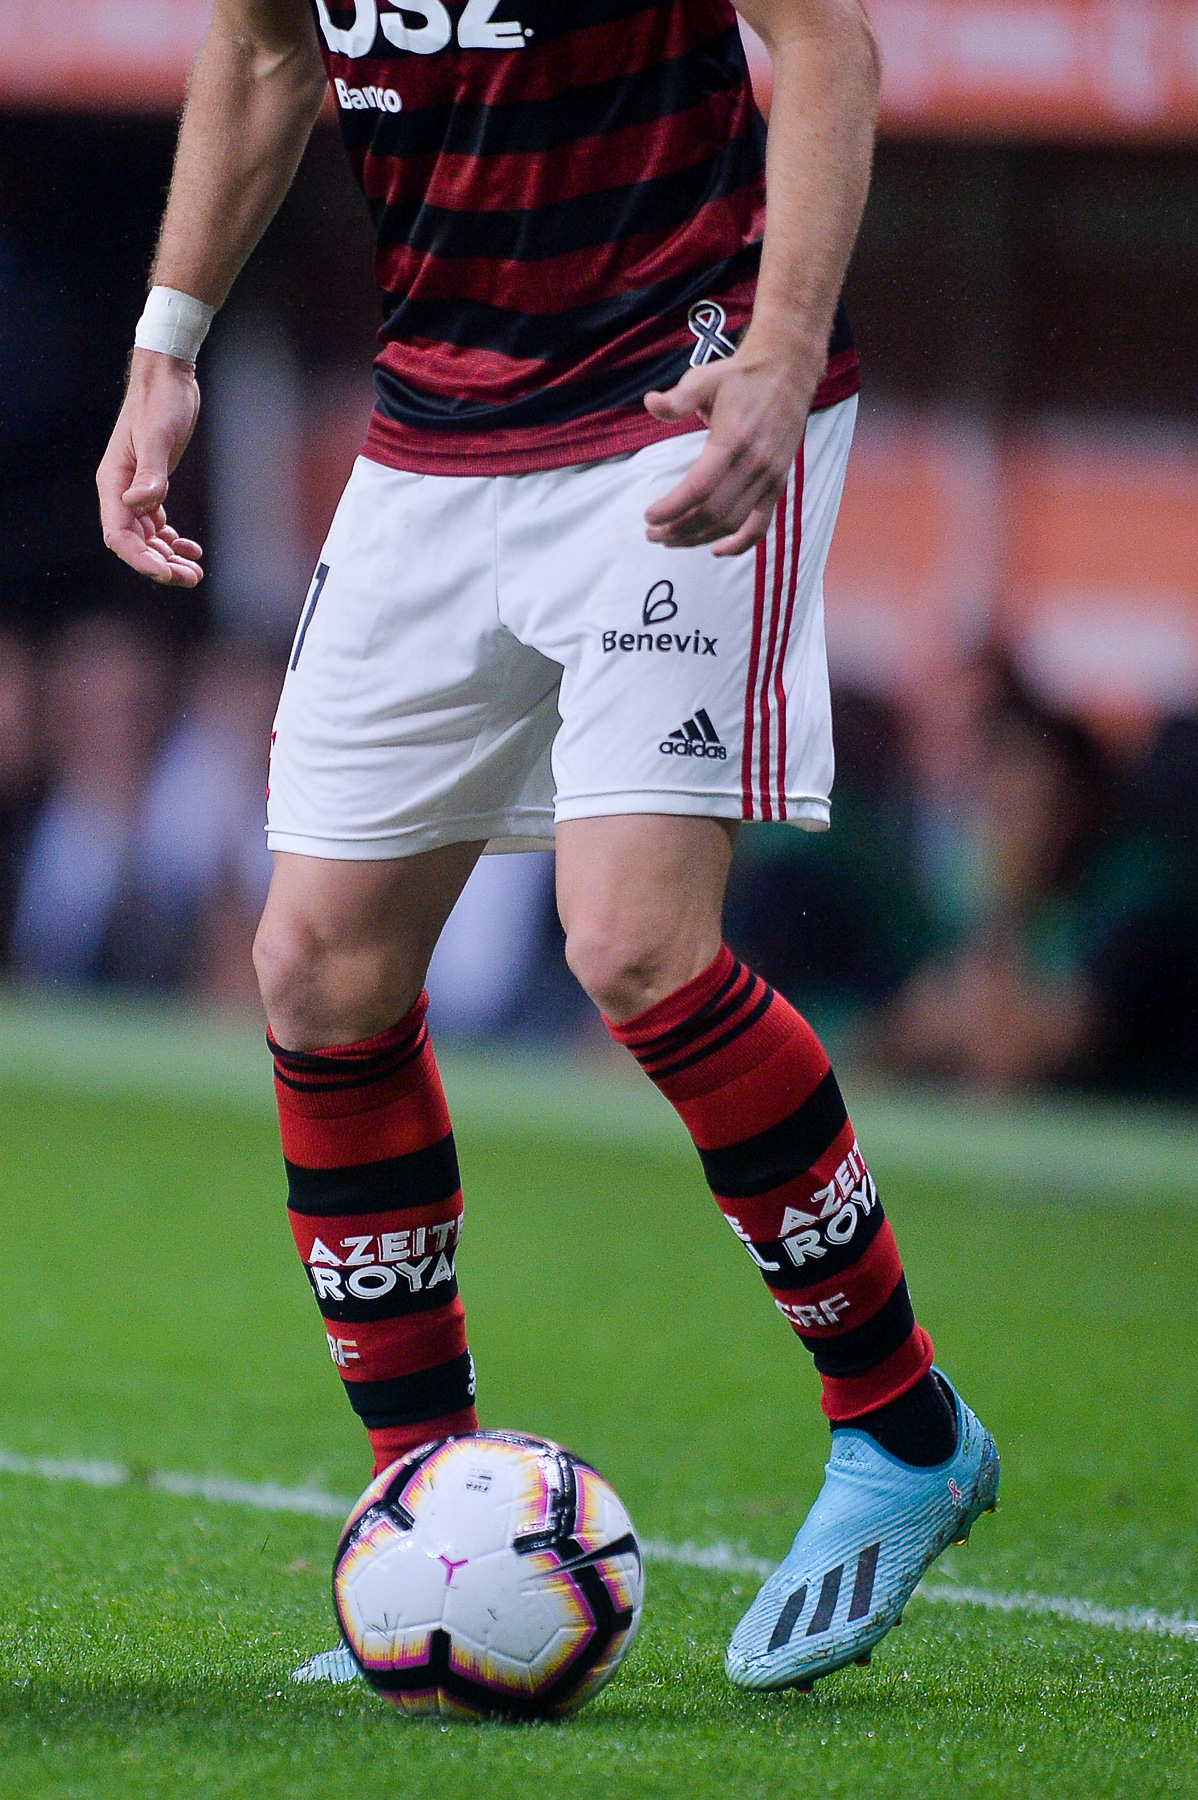 Gremio_X_Flamengo_dudabairros_Eleven_146